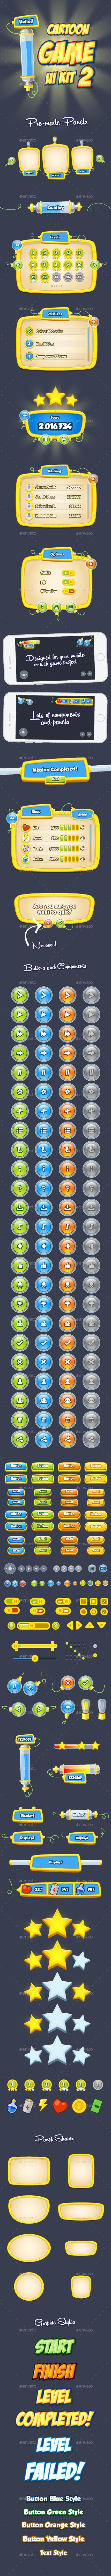 Cartoon Game UI Kit #2 - Game Kits #Game #Assets Download here: https://graphicriver.net/item/cartoon-game-ui-kit-2/14470694?ref=alena994